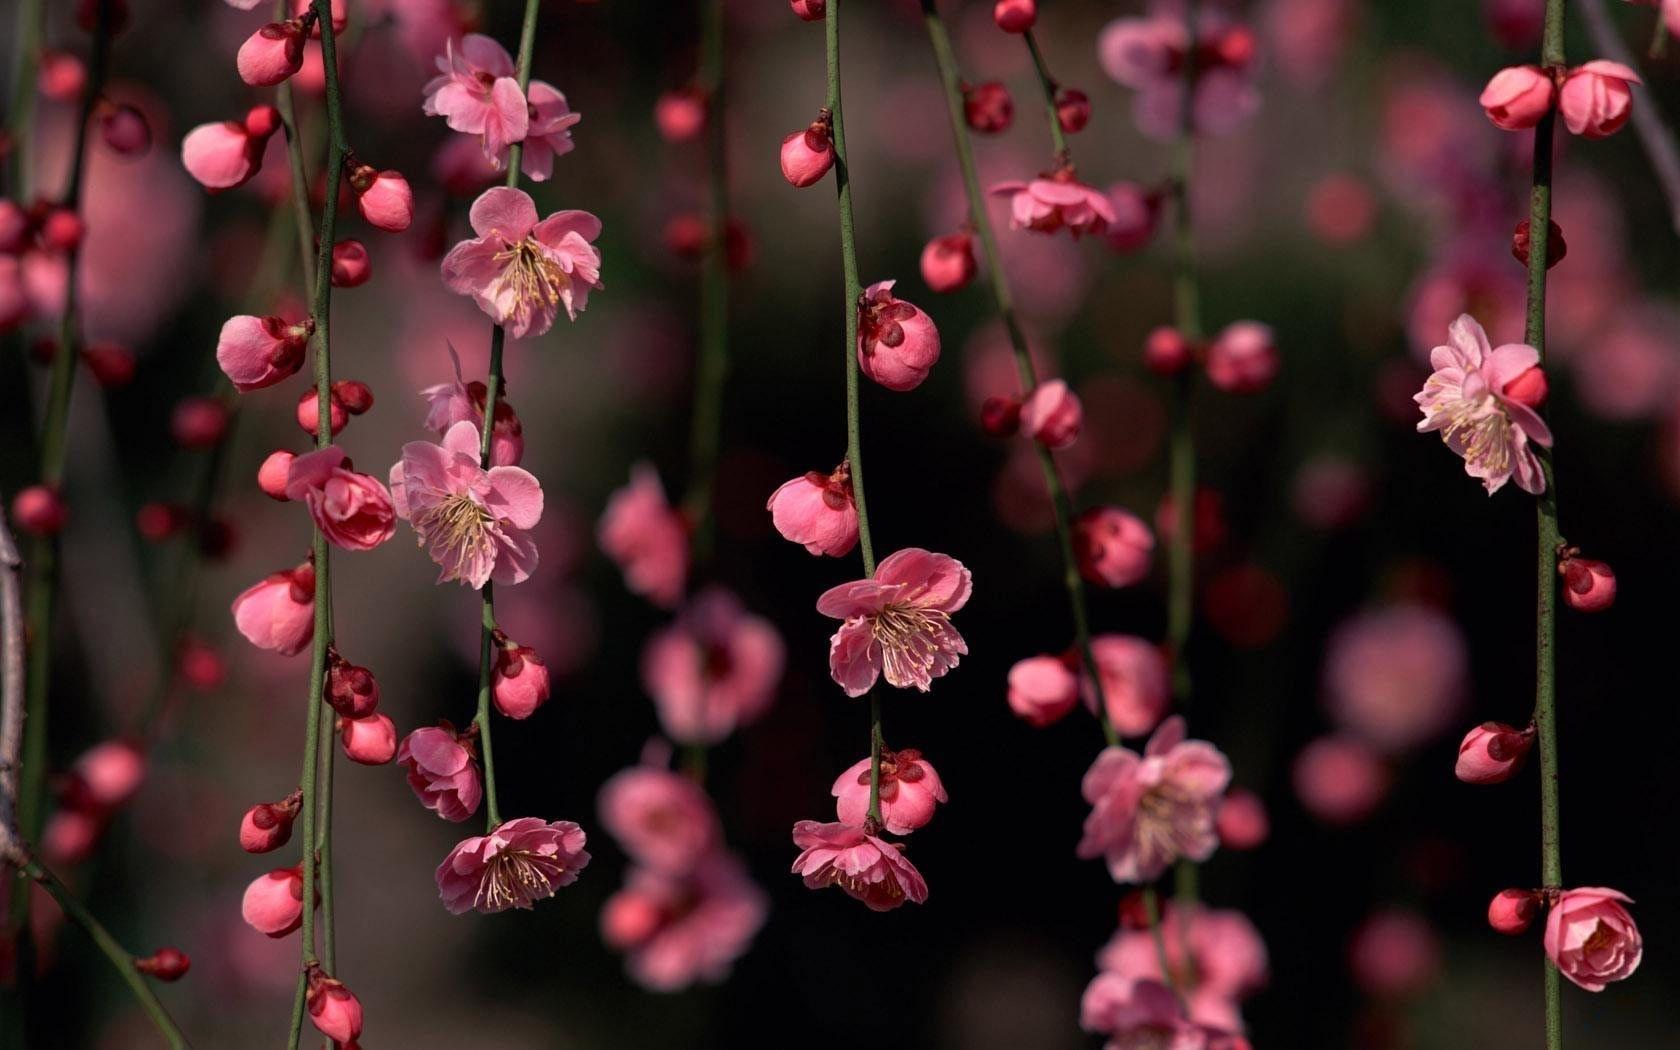 spring flowers wallpaper desktop background | natures wallpapers